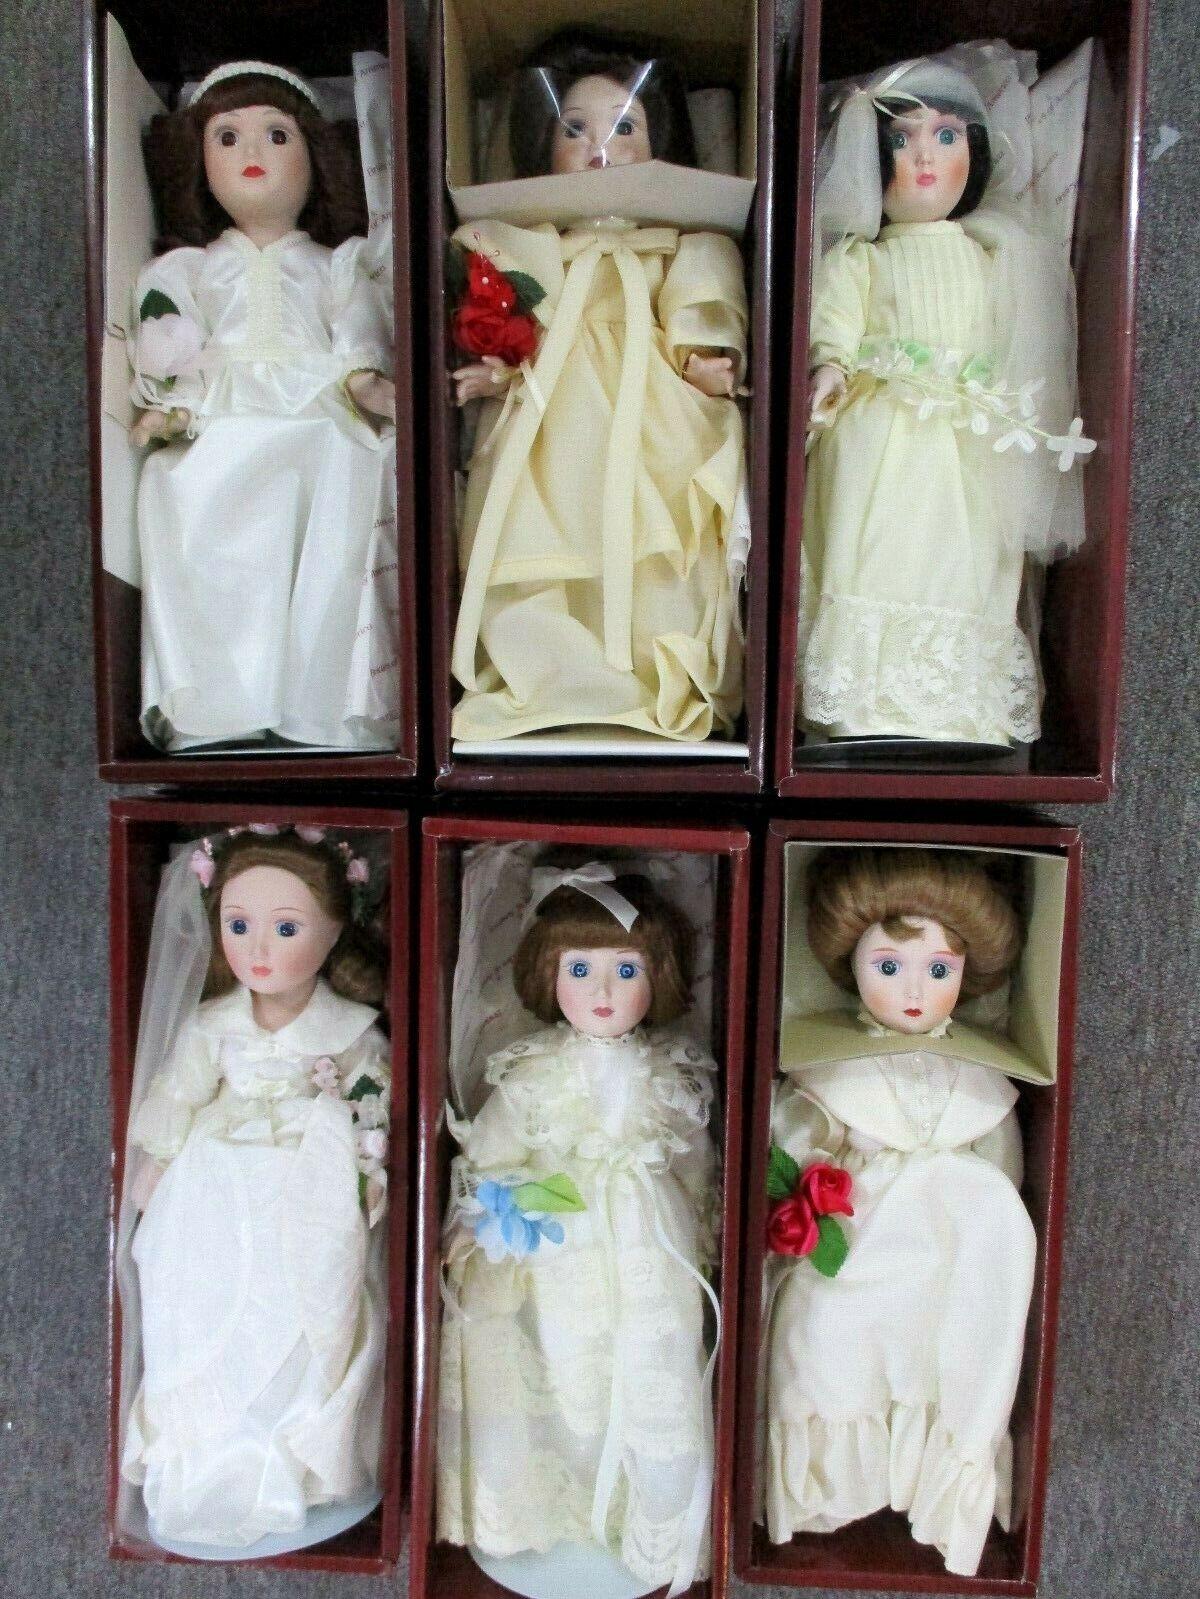 Danbury Mint Brides Of America Porcelain Dolls Lot of 6 In Original Boxes Lot-A